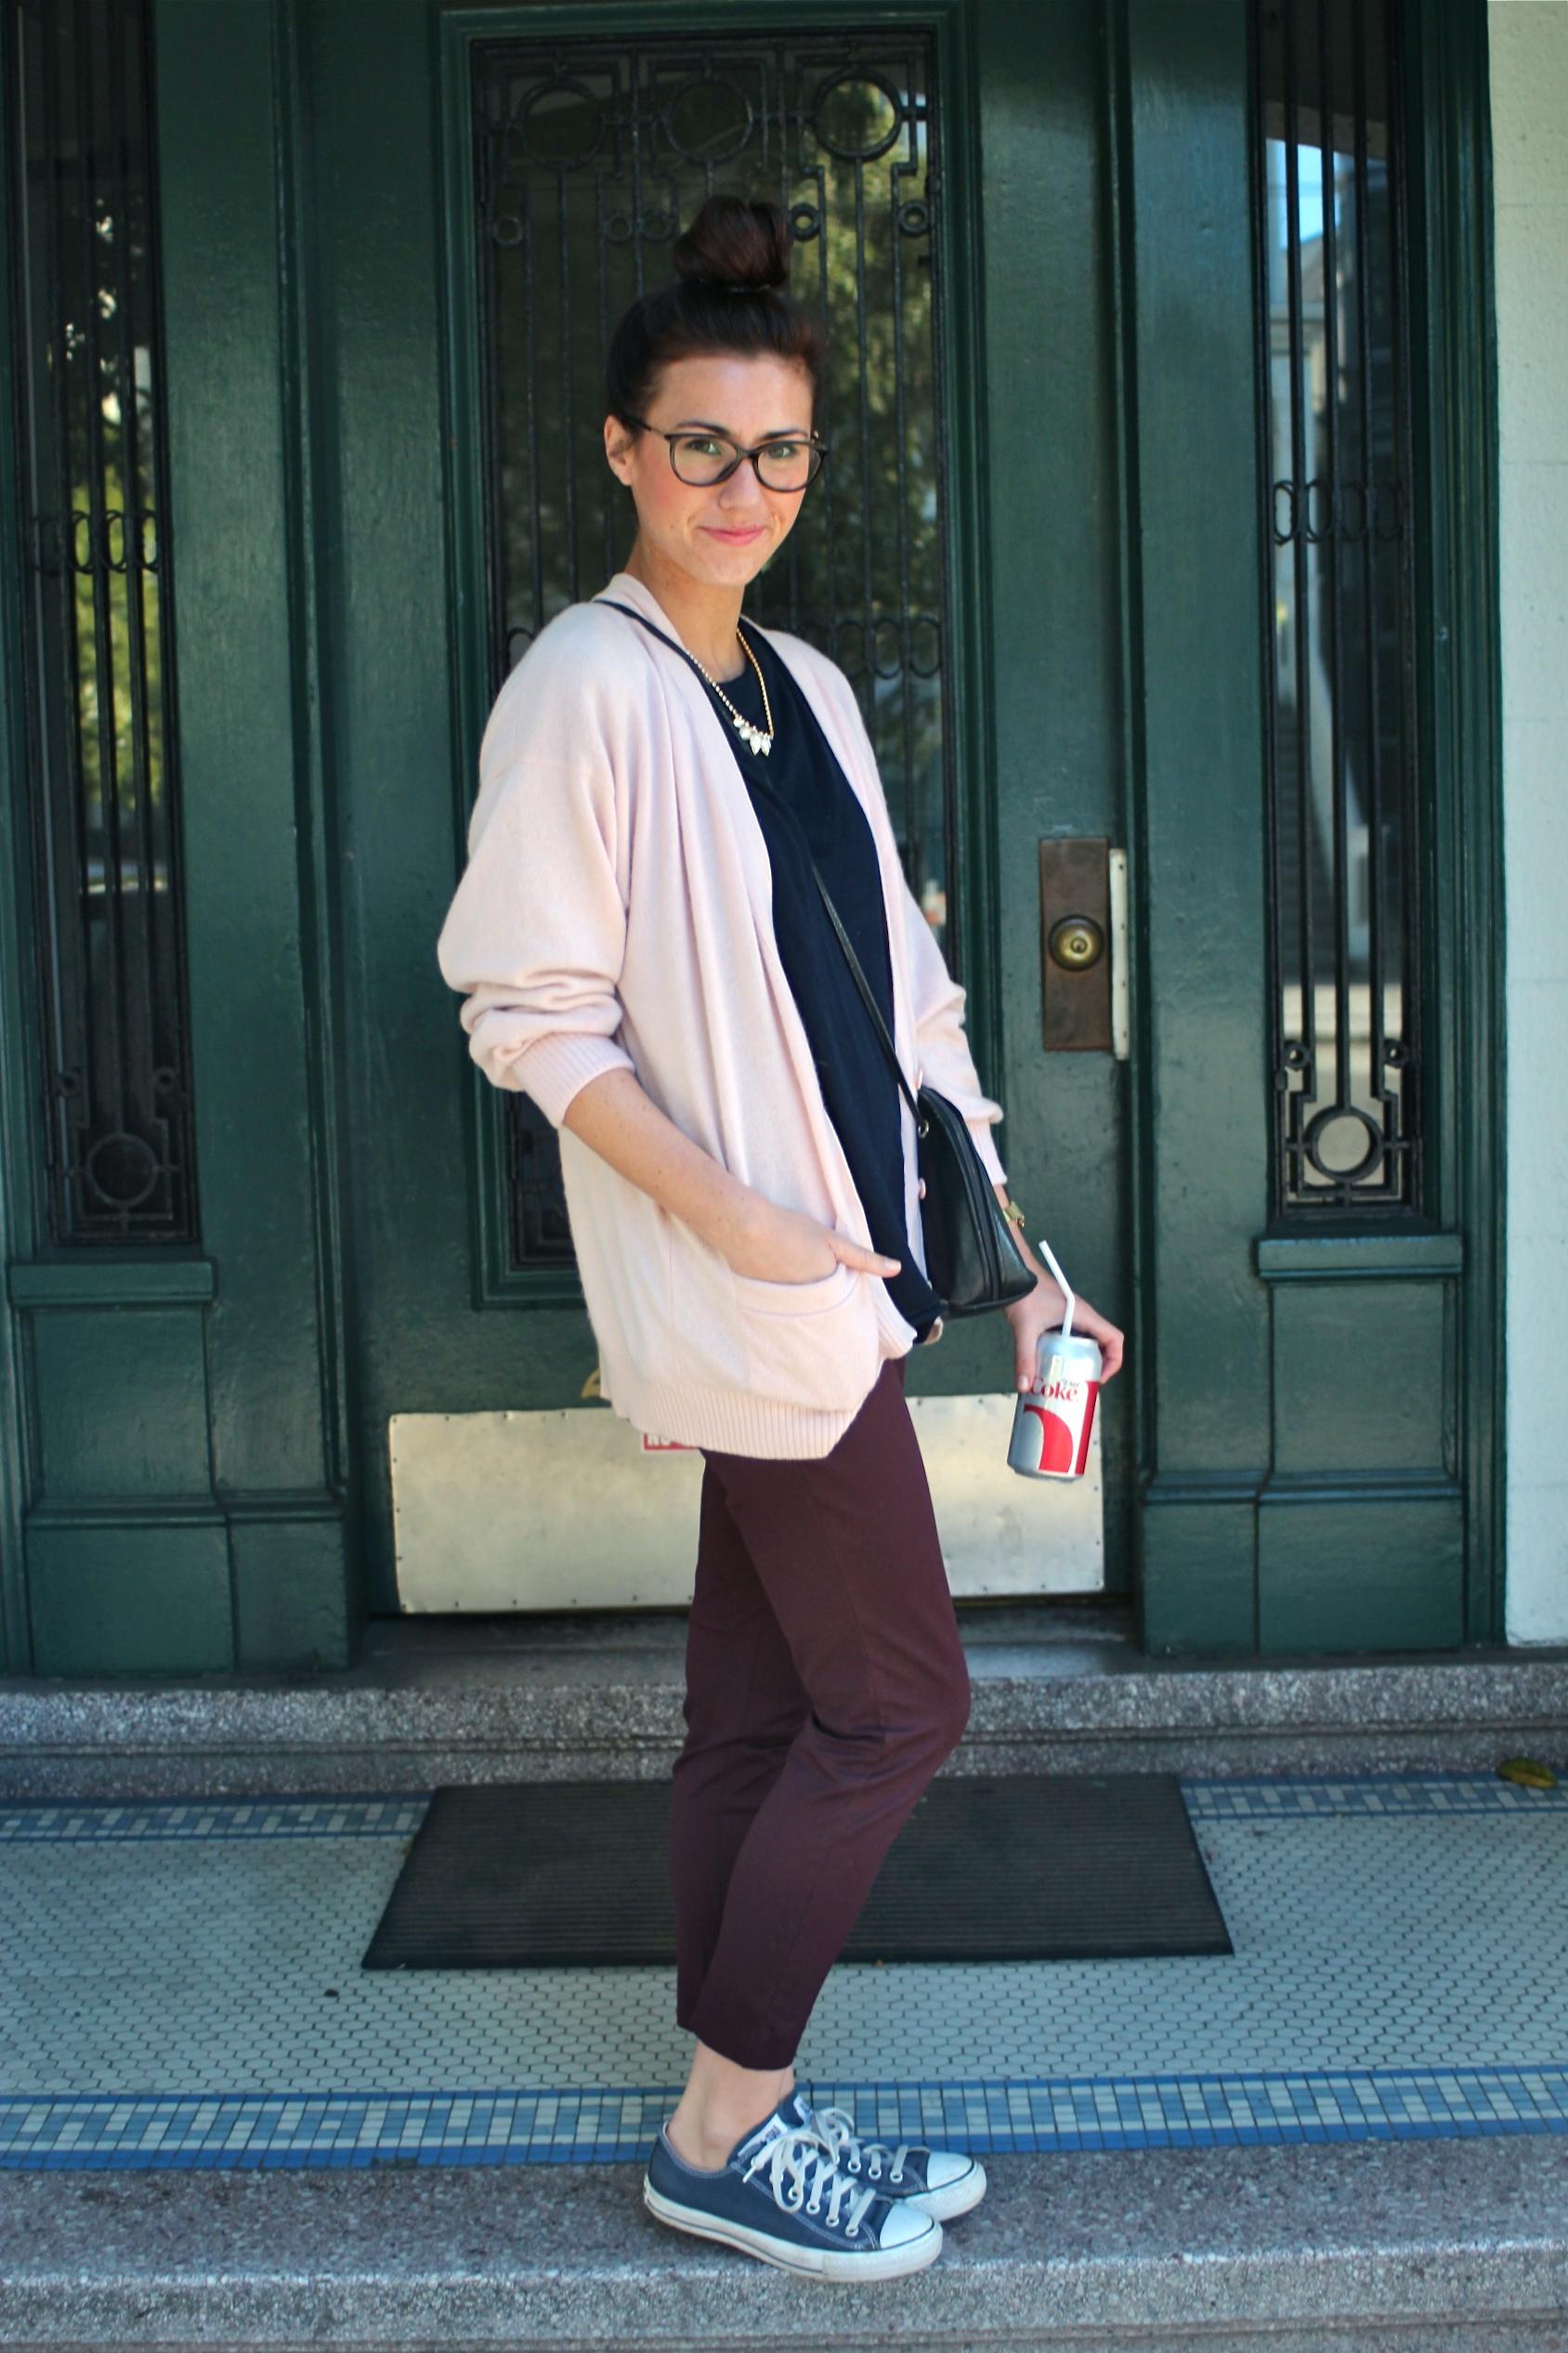 Cashmere Cardigan: Vintage;  Sweater: Jigsaw London ;  Elliot Pant: Babaton, Aritzia ; Sneakers: Converse; Bag: Vintage, circa 1980s; Necklace: Vintage